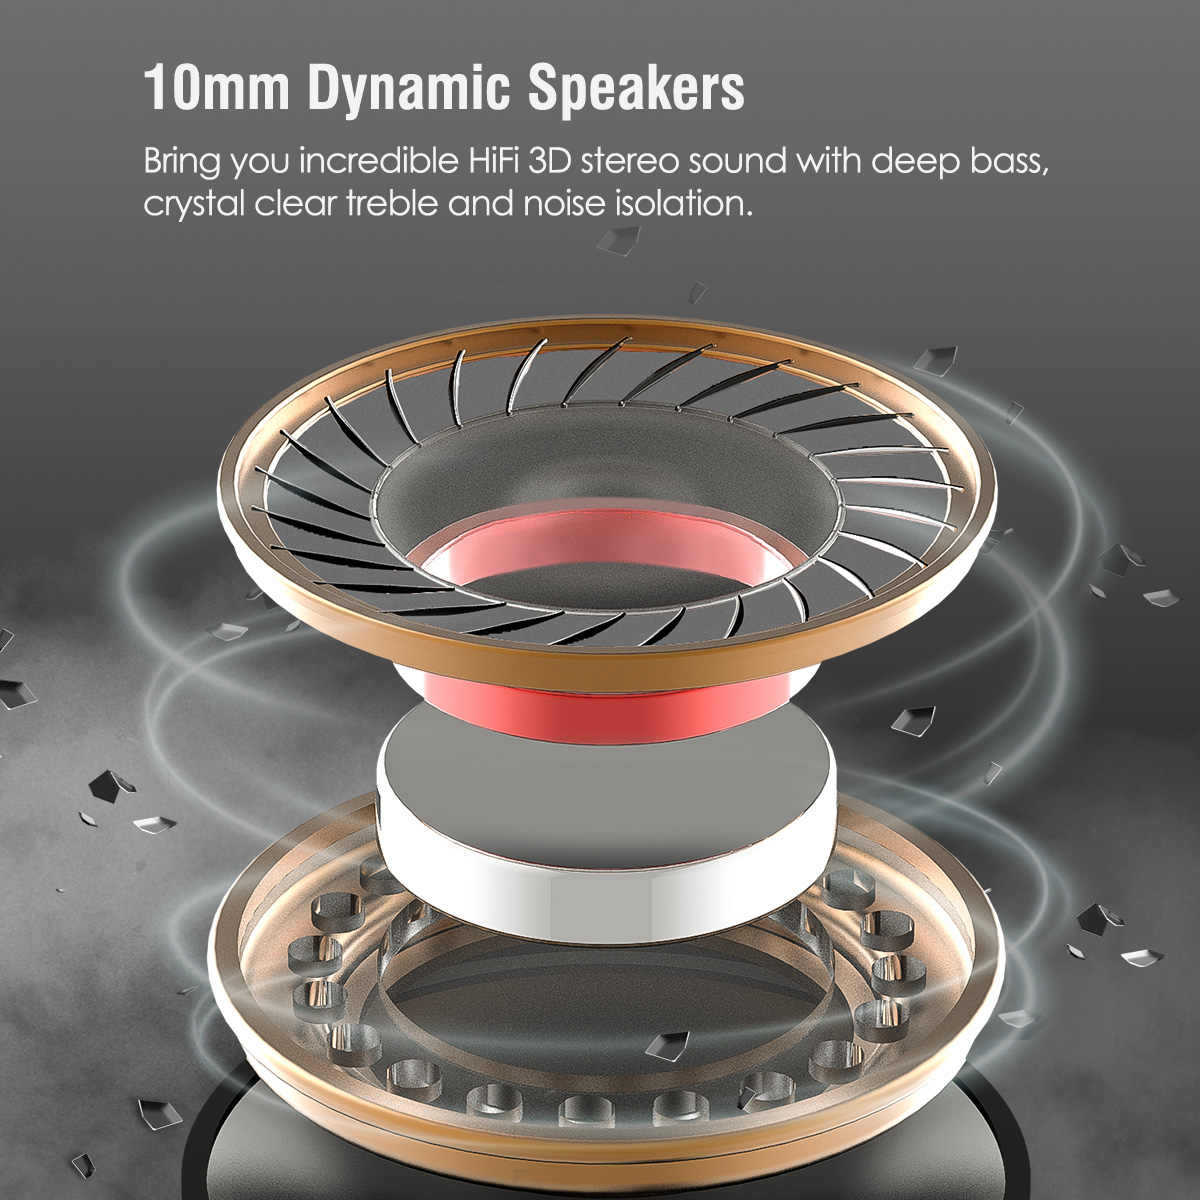 Mixcder Wireless Bluetooth TWS Earphone Waterproof Sport Headset Earphones Earbuds with Microphone Headphone